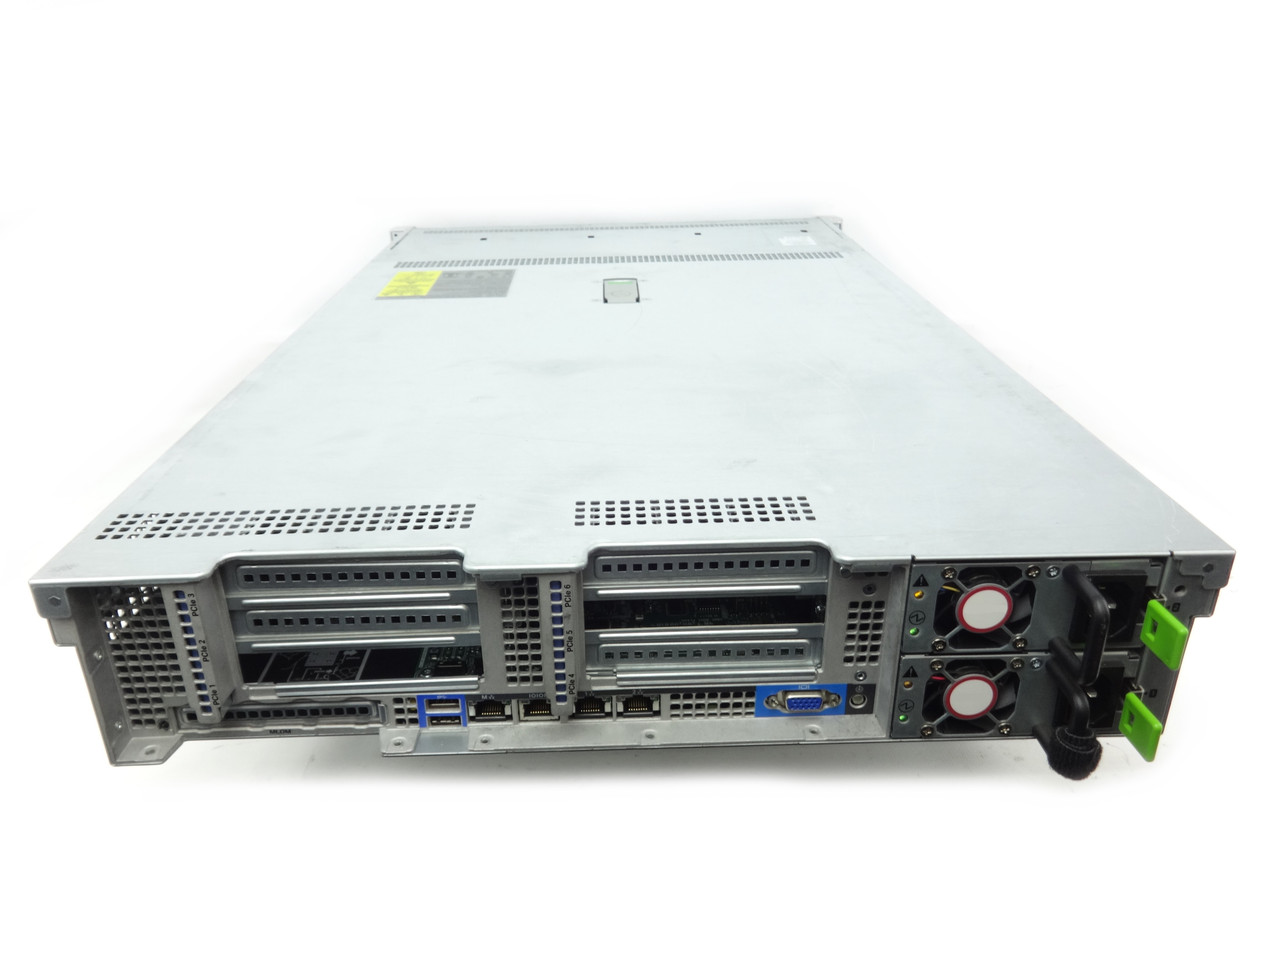 Cisco UCS C240 M4 Back of Server